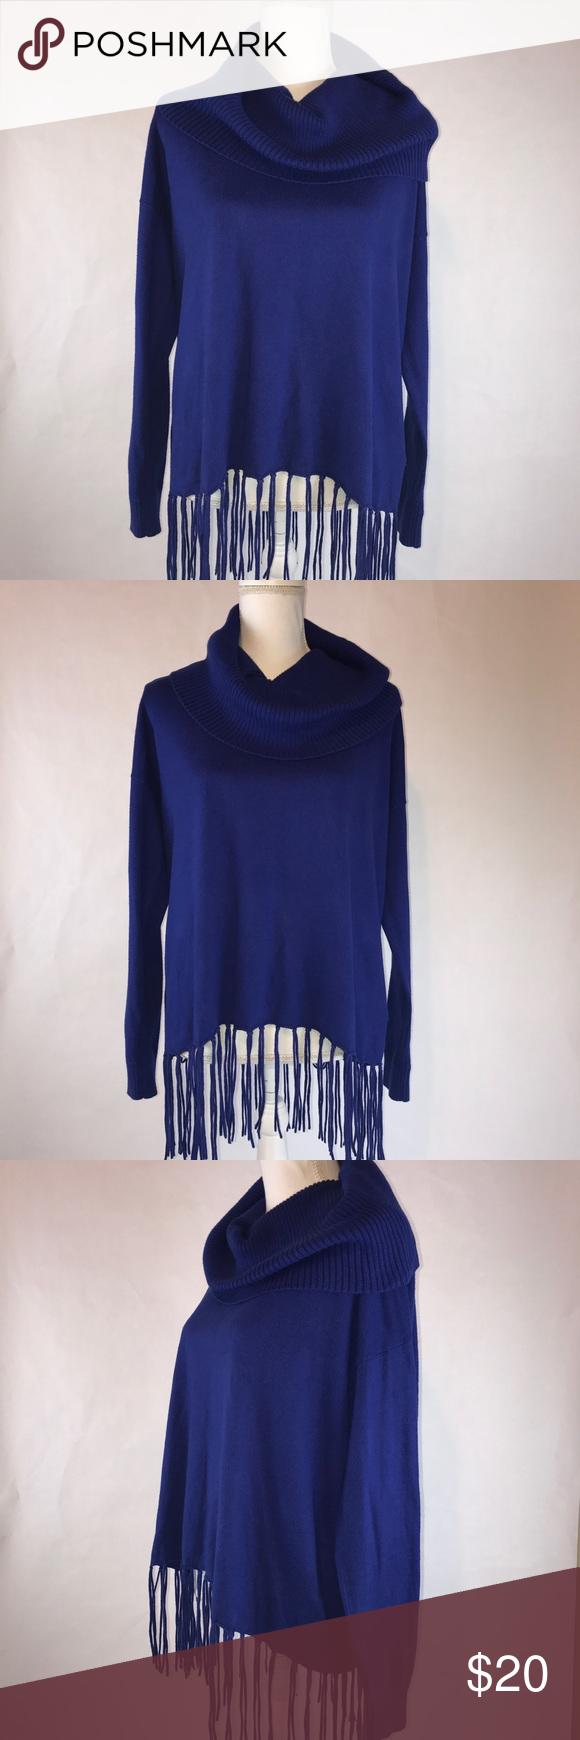 Michael Kors Royal Blue Fringe Cowl Neck Sweater